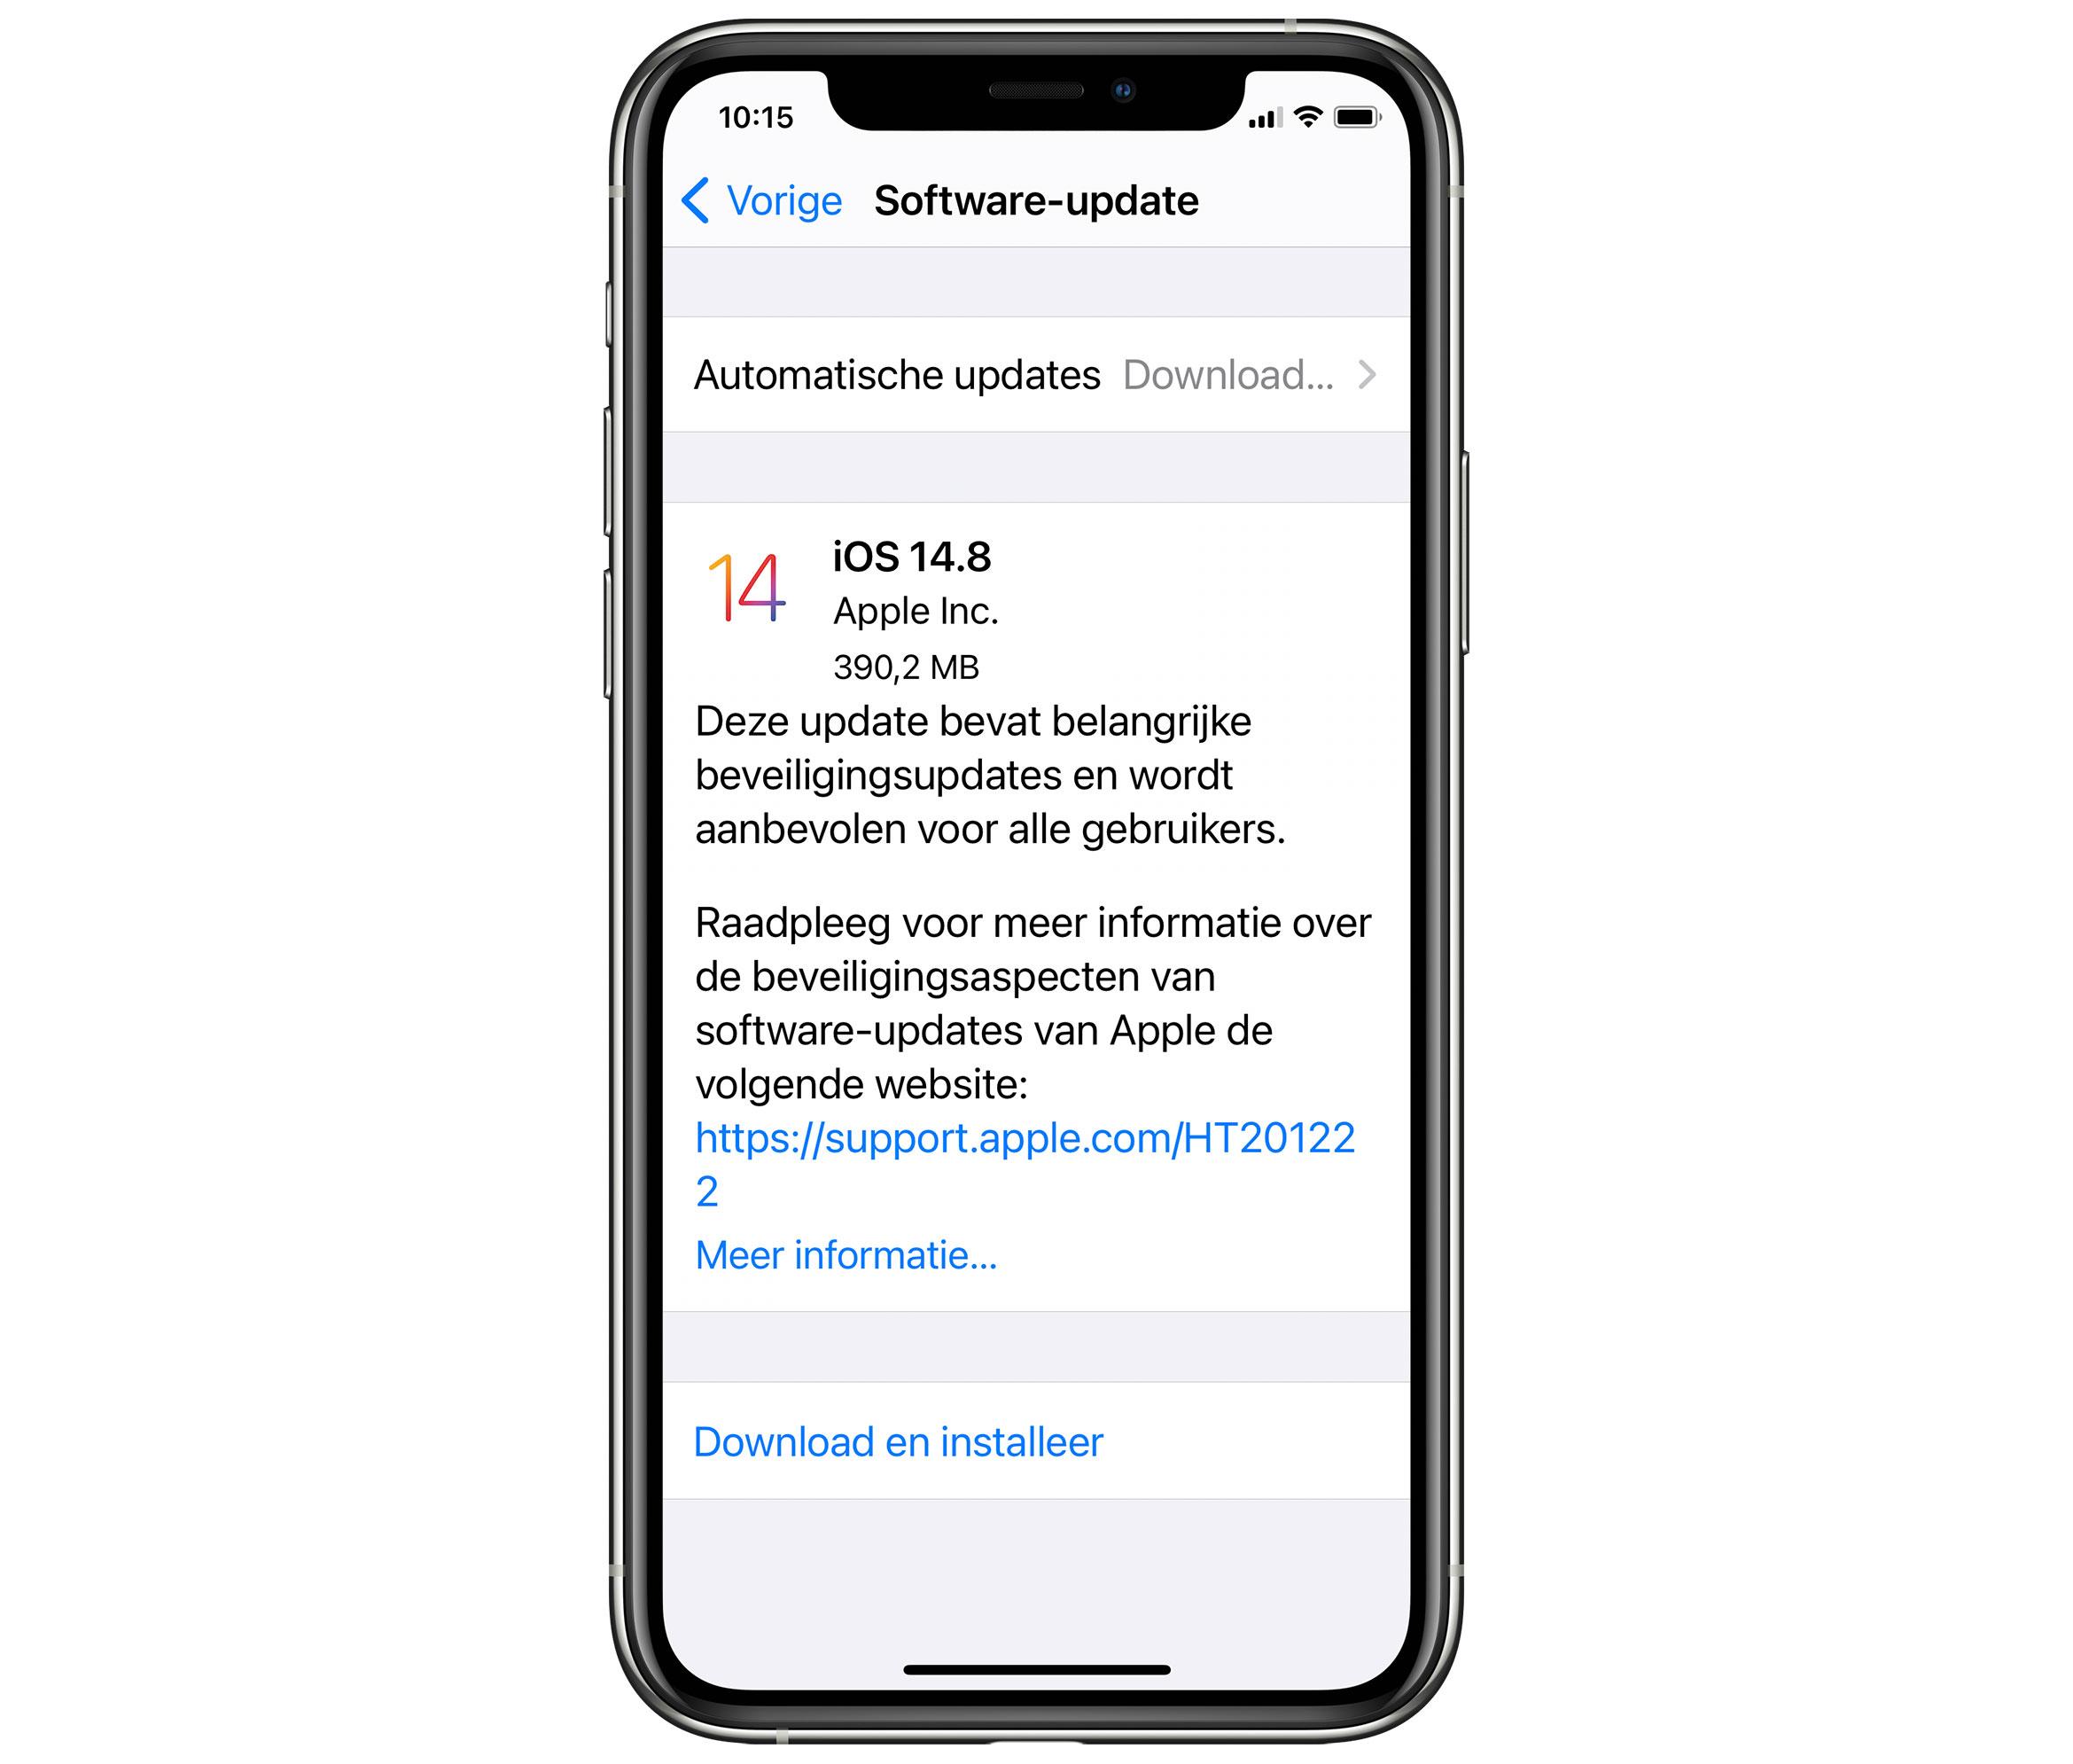 https://www.macfreak.nl/modules/news/images/zArt.iOS14.8ReleaseNotes.jpg